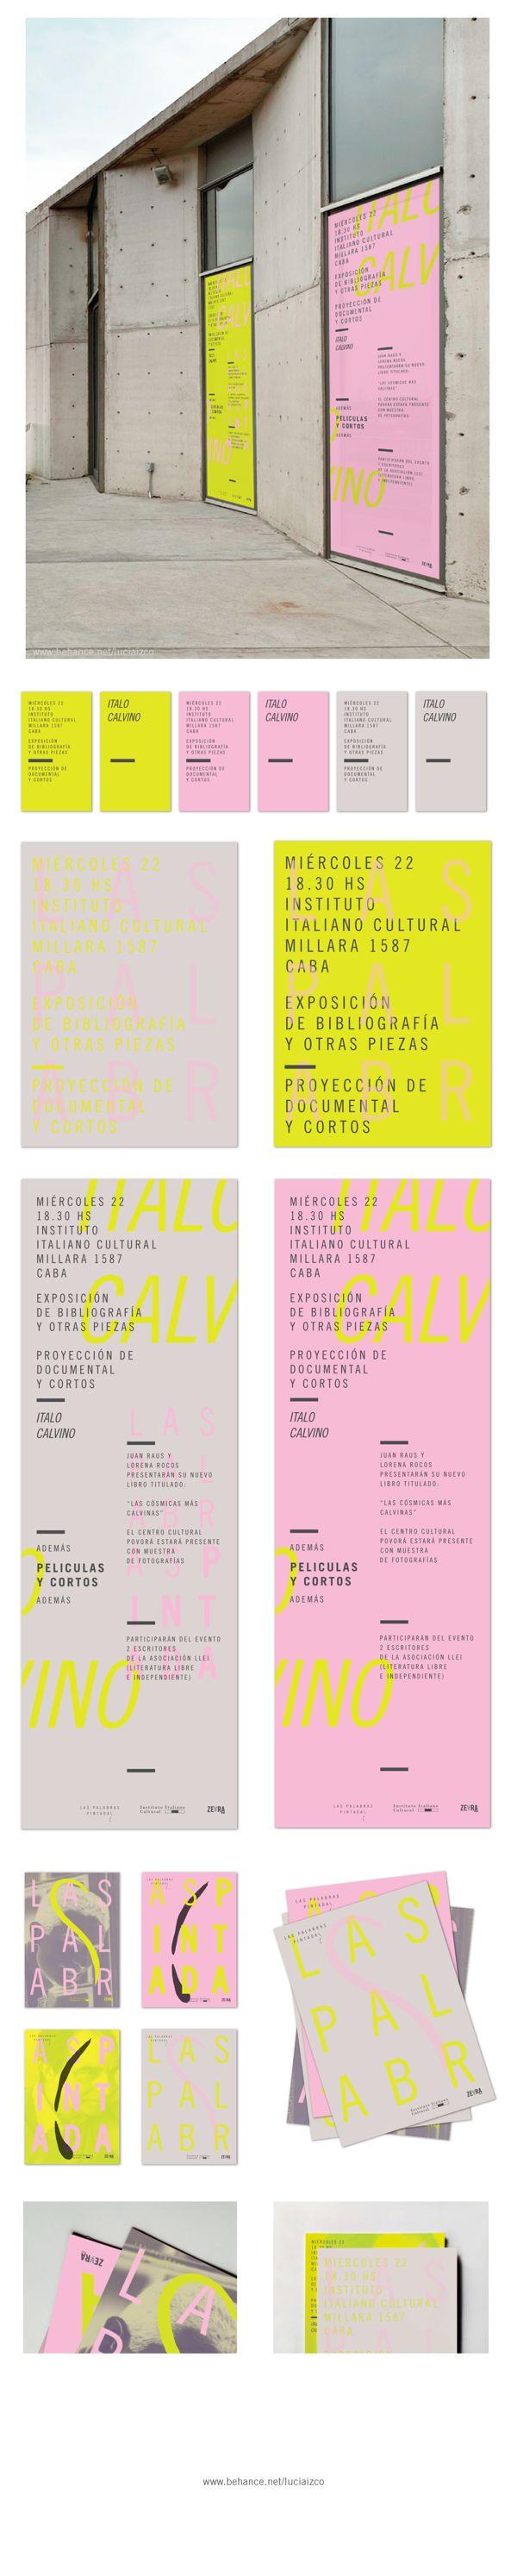 PINK & YELLOW Las Palabras Pintadas by Lucia Izco by Lucía Izco, via Behance